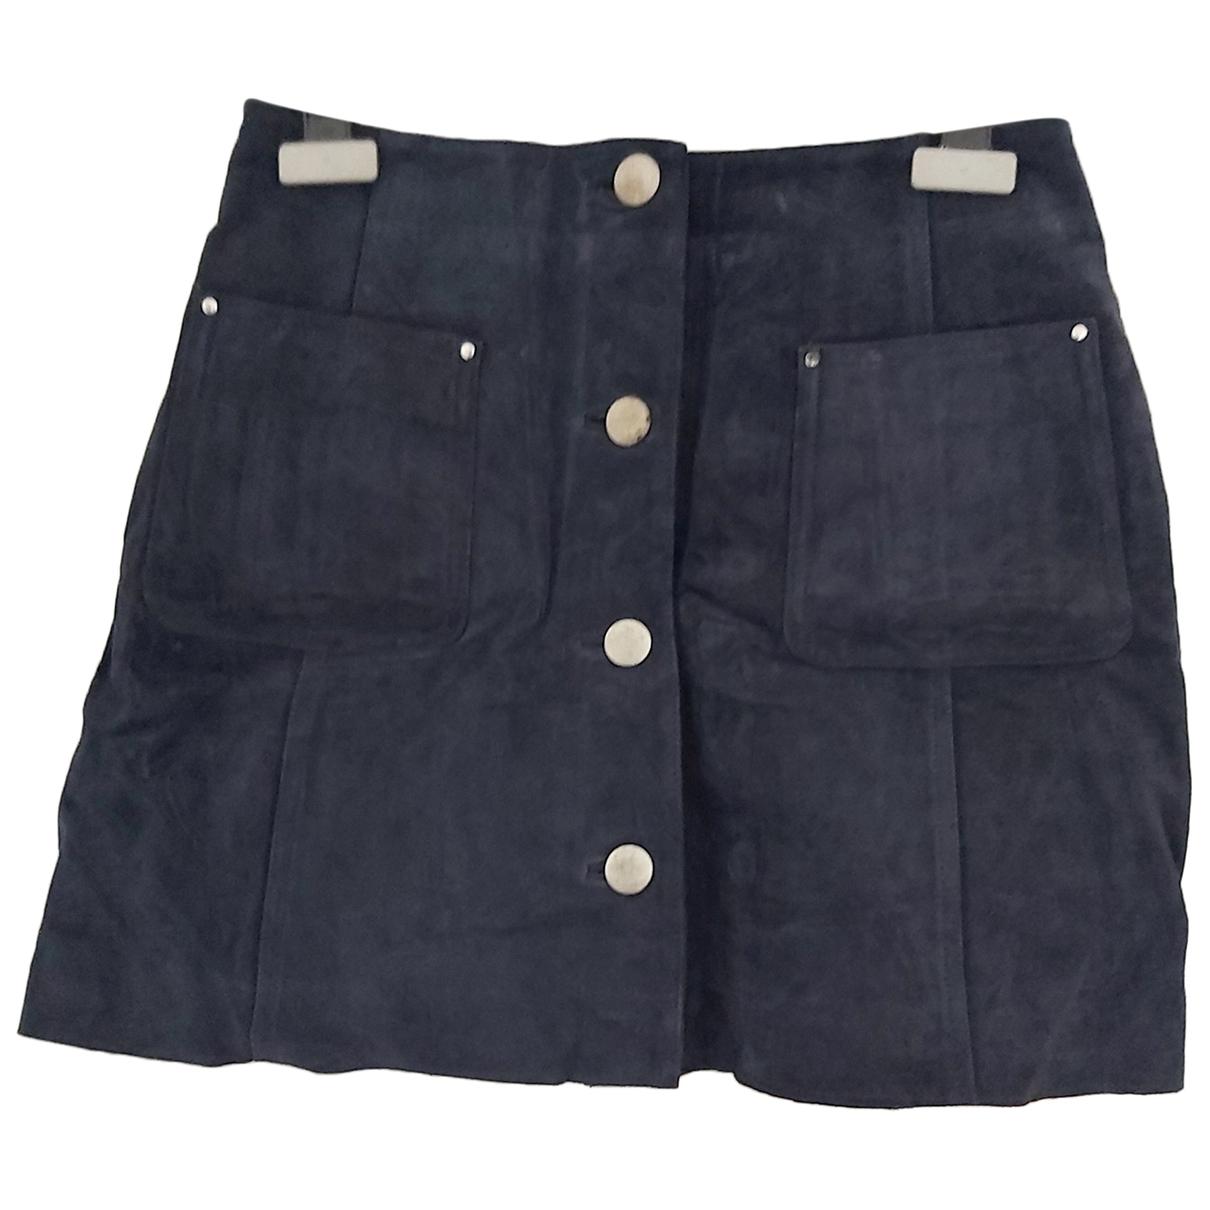 Asos \N Blue Suede skirt for Women 36 FR